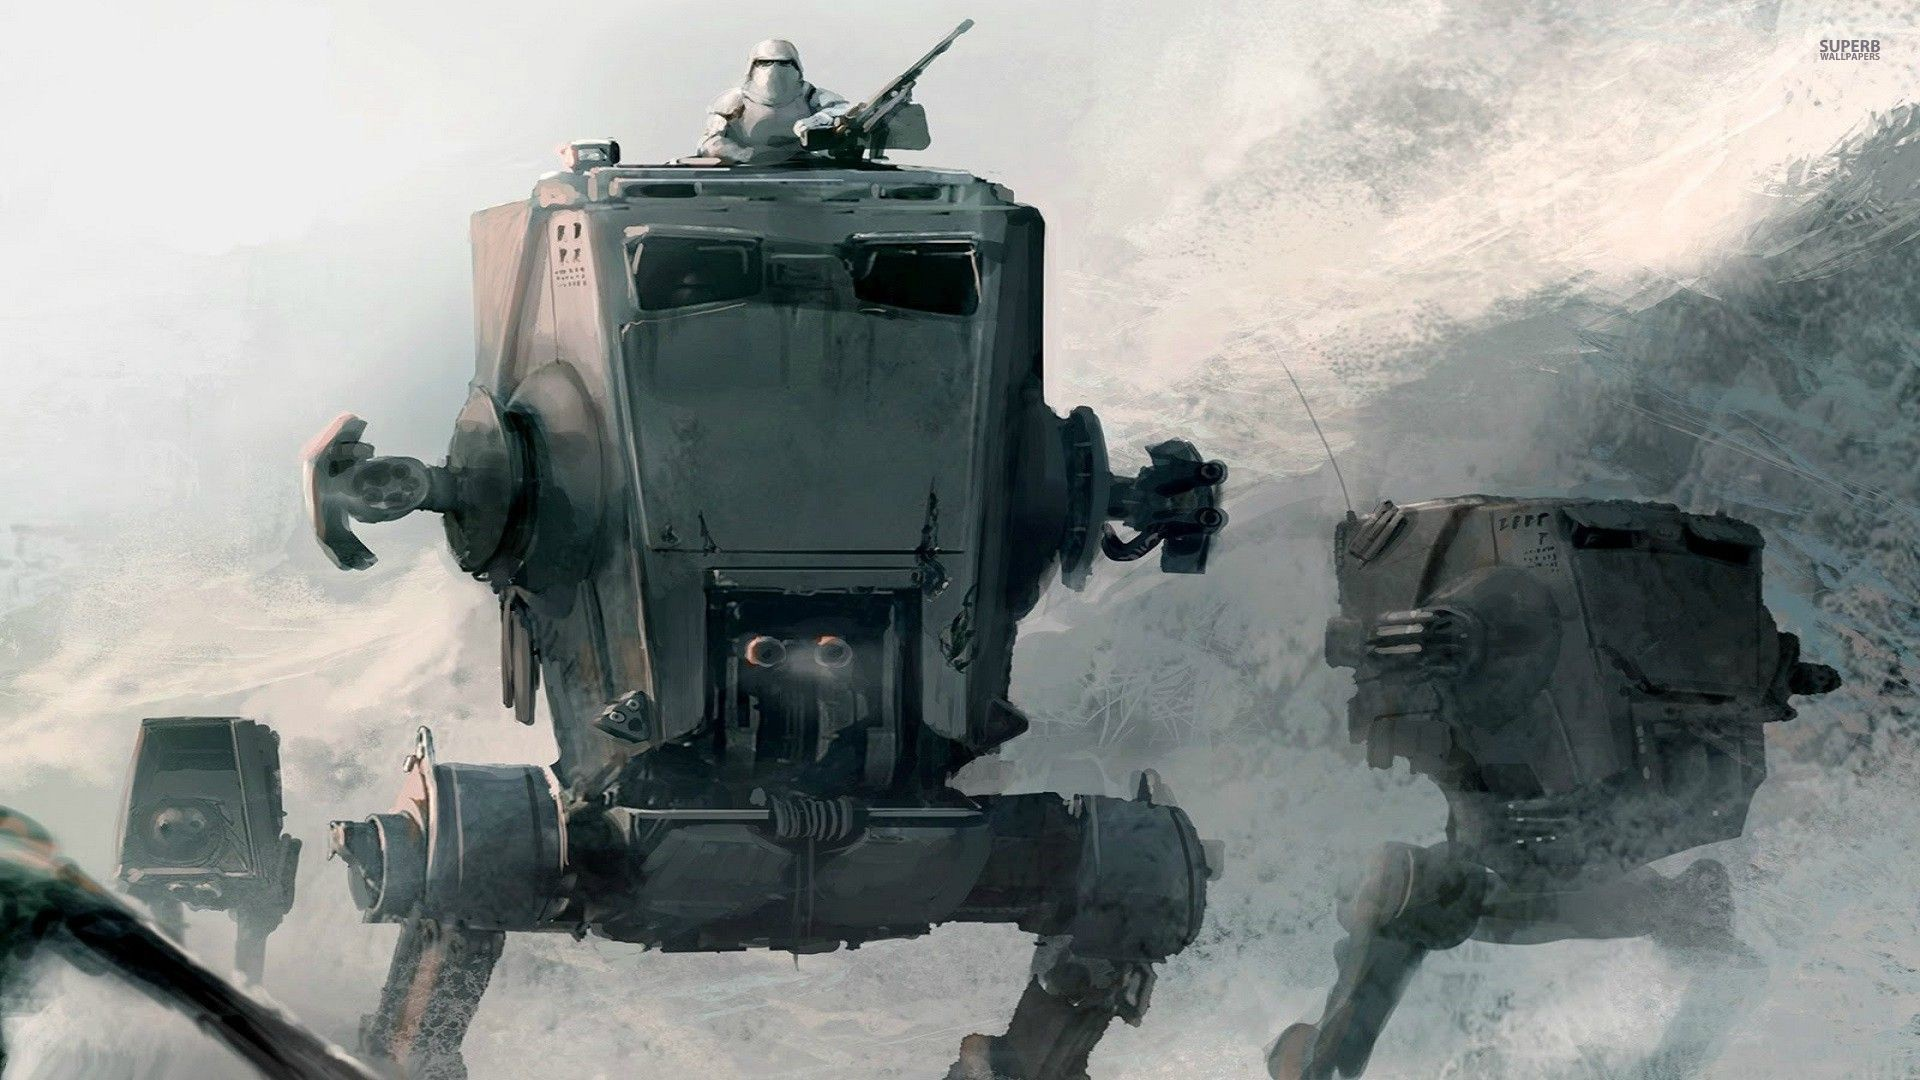 stormtrooper concept art – Google Search · Star Wars WallpaperSci …